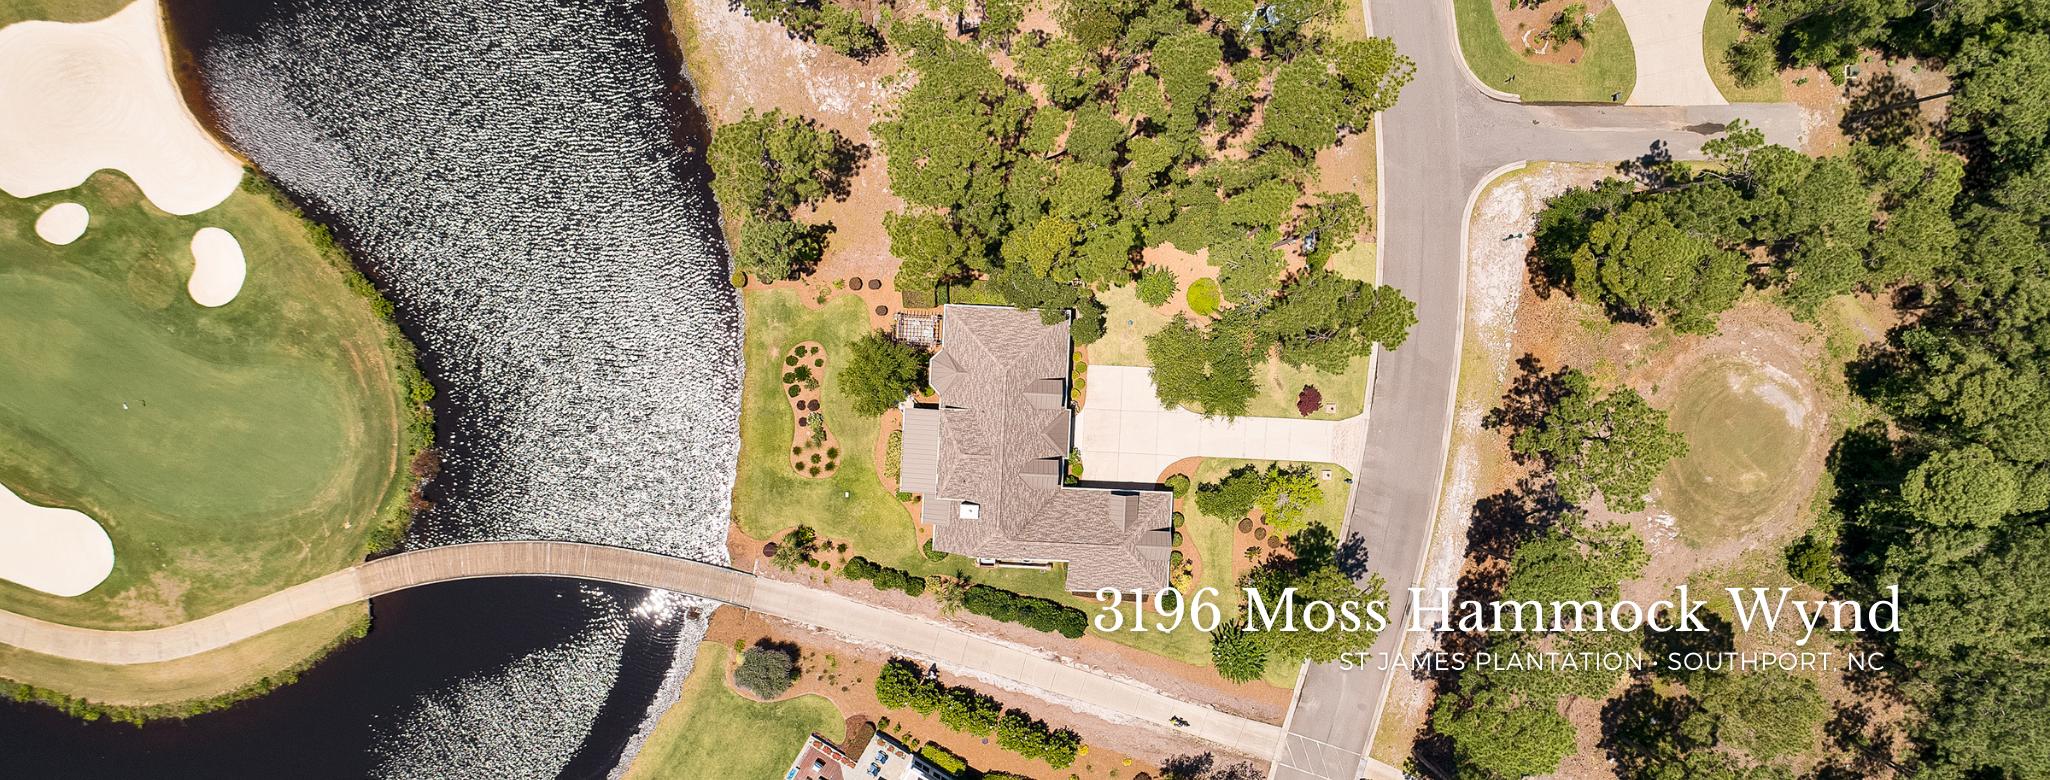 3196 Moss Hammock Wynd